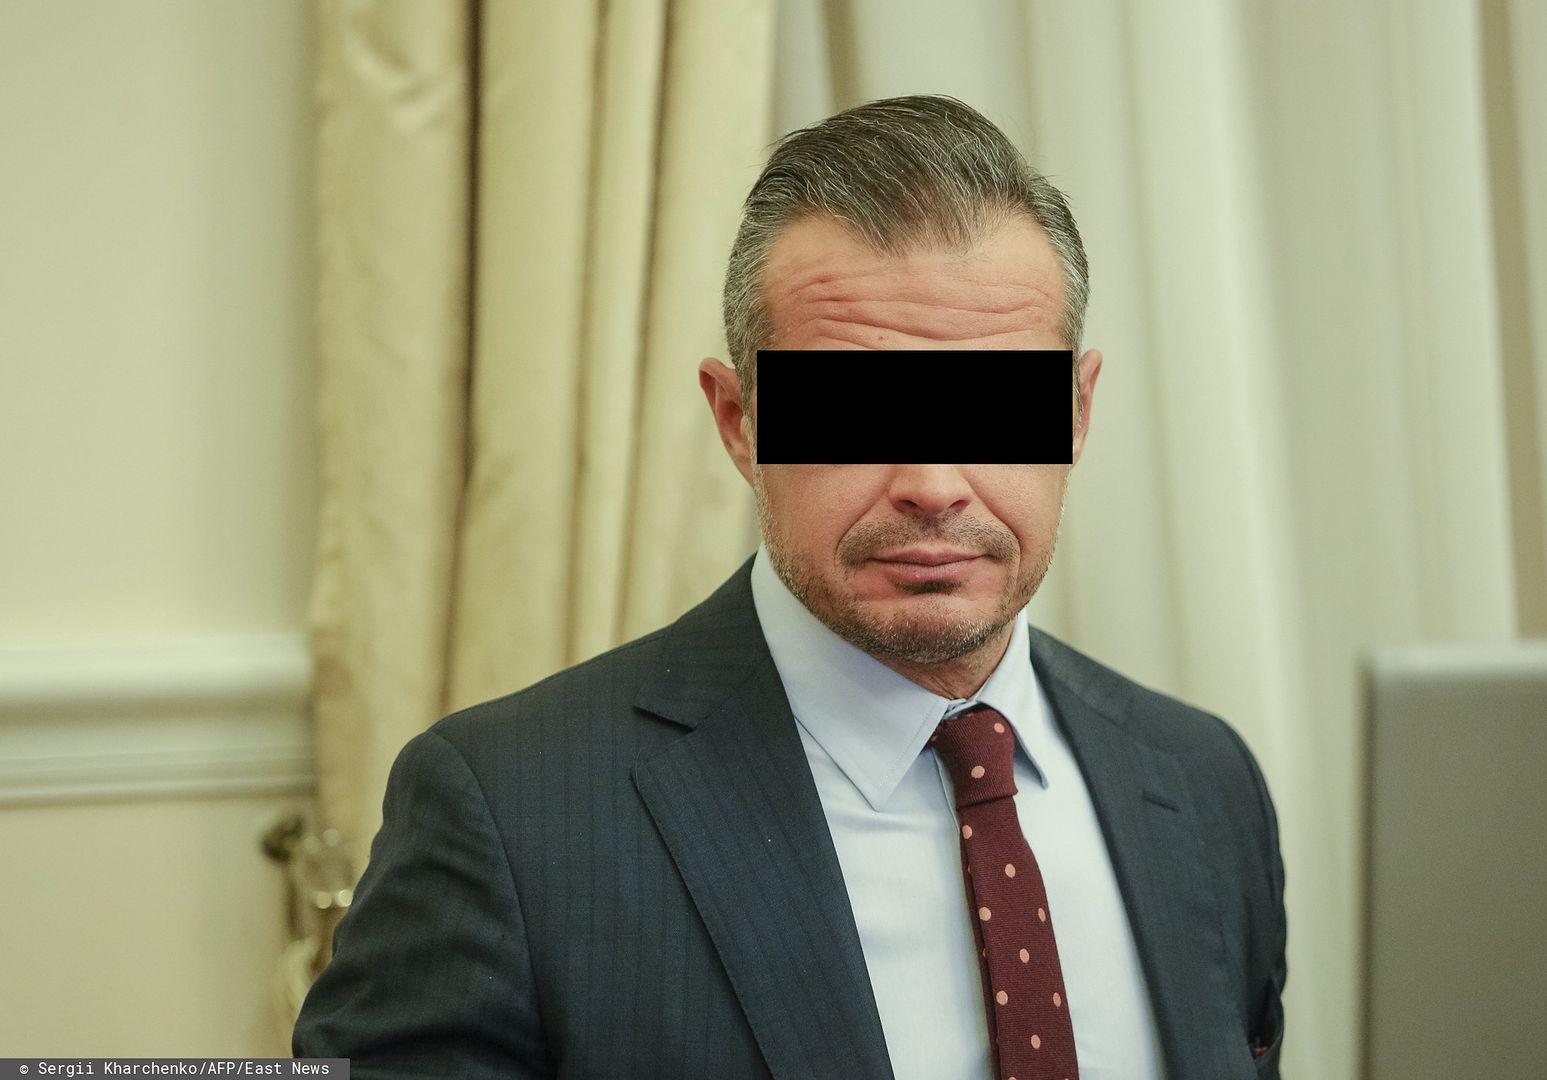 wiadomosci.wp.pl